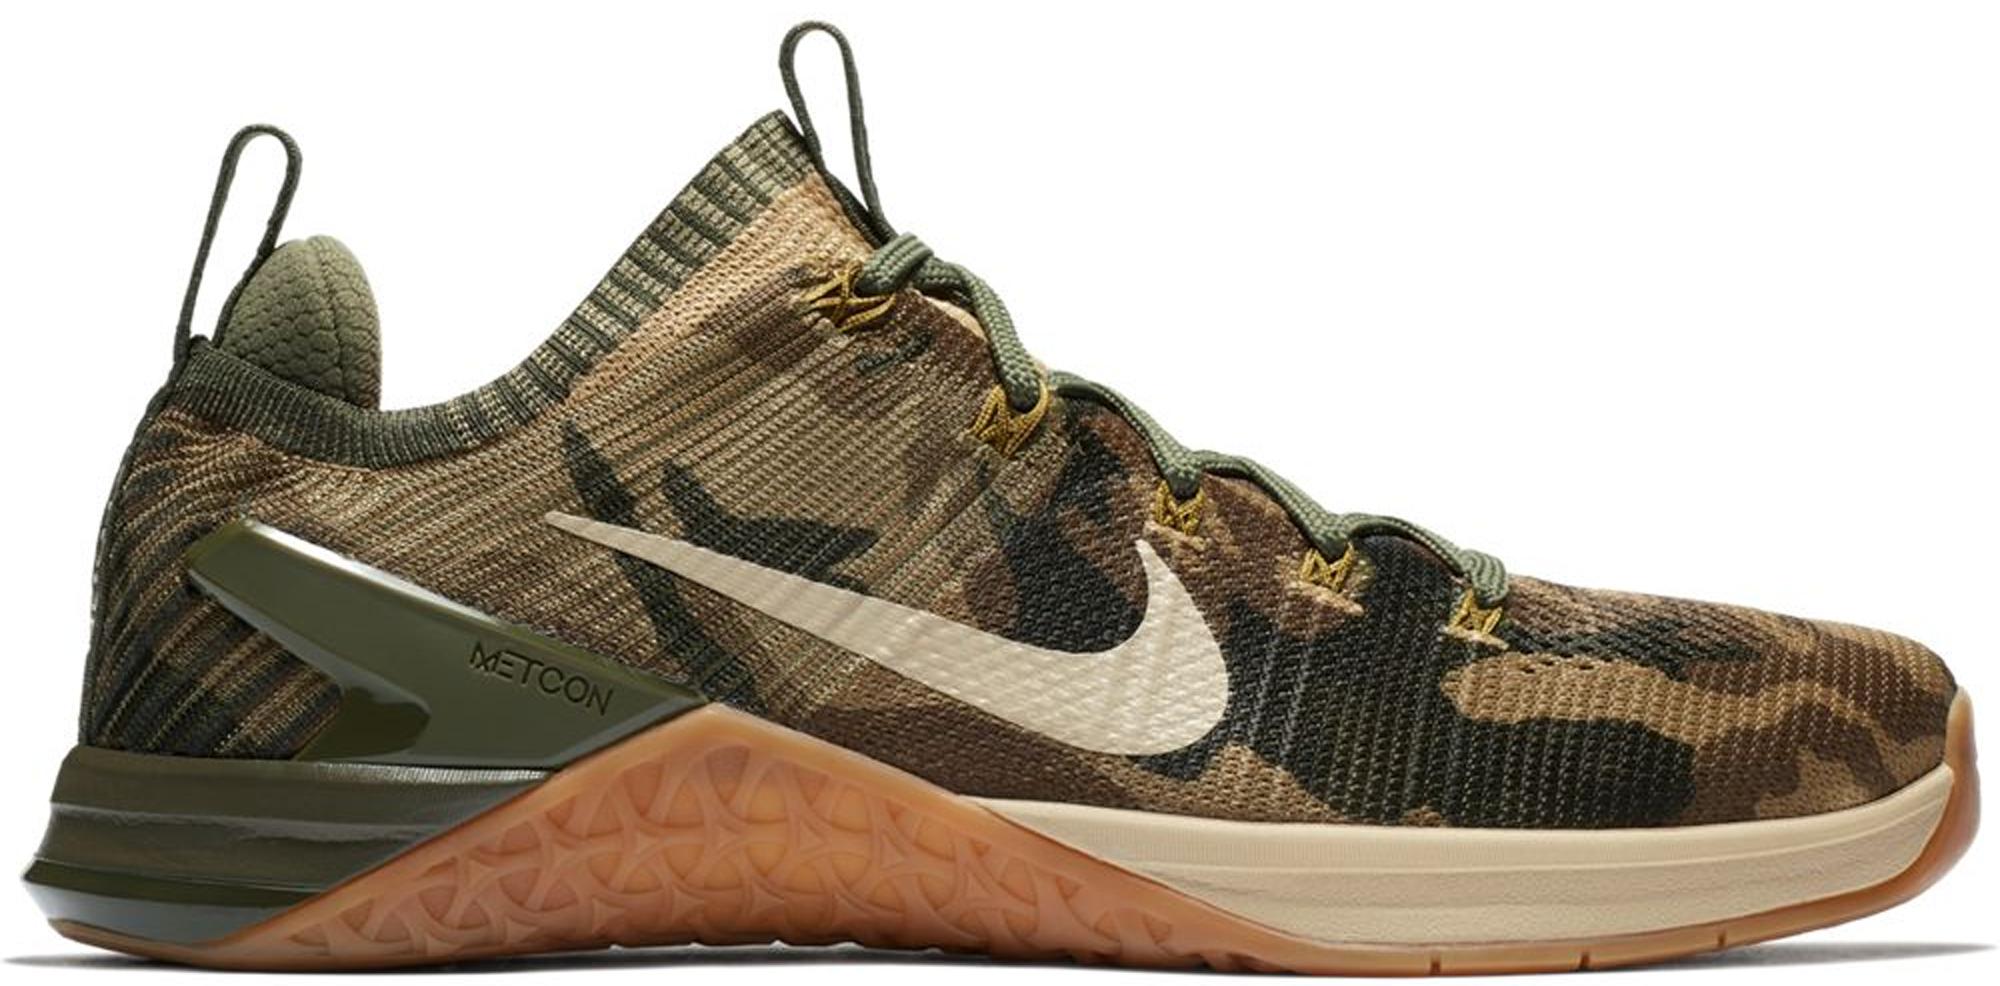 Nike Metcon DSX Flyknit 2 Army Camo